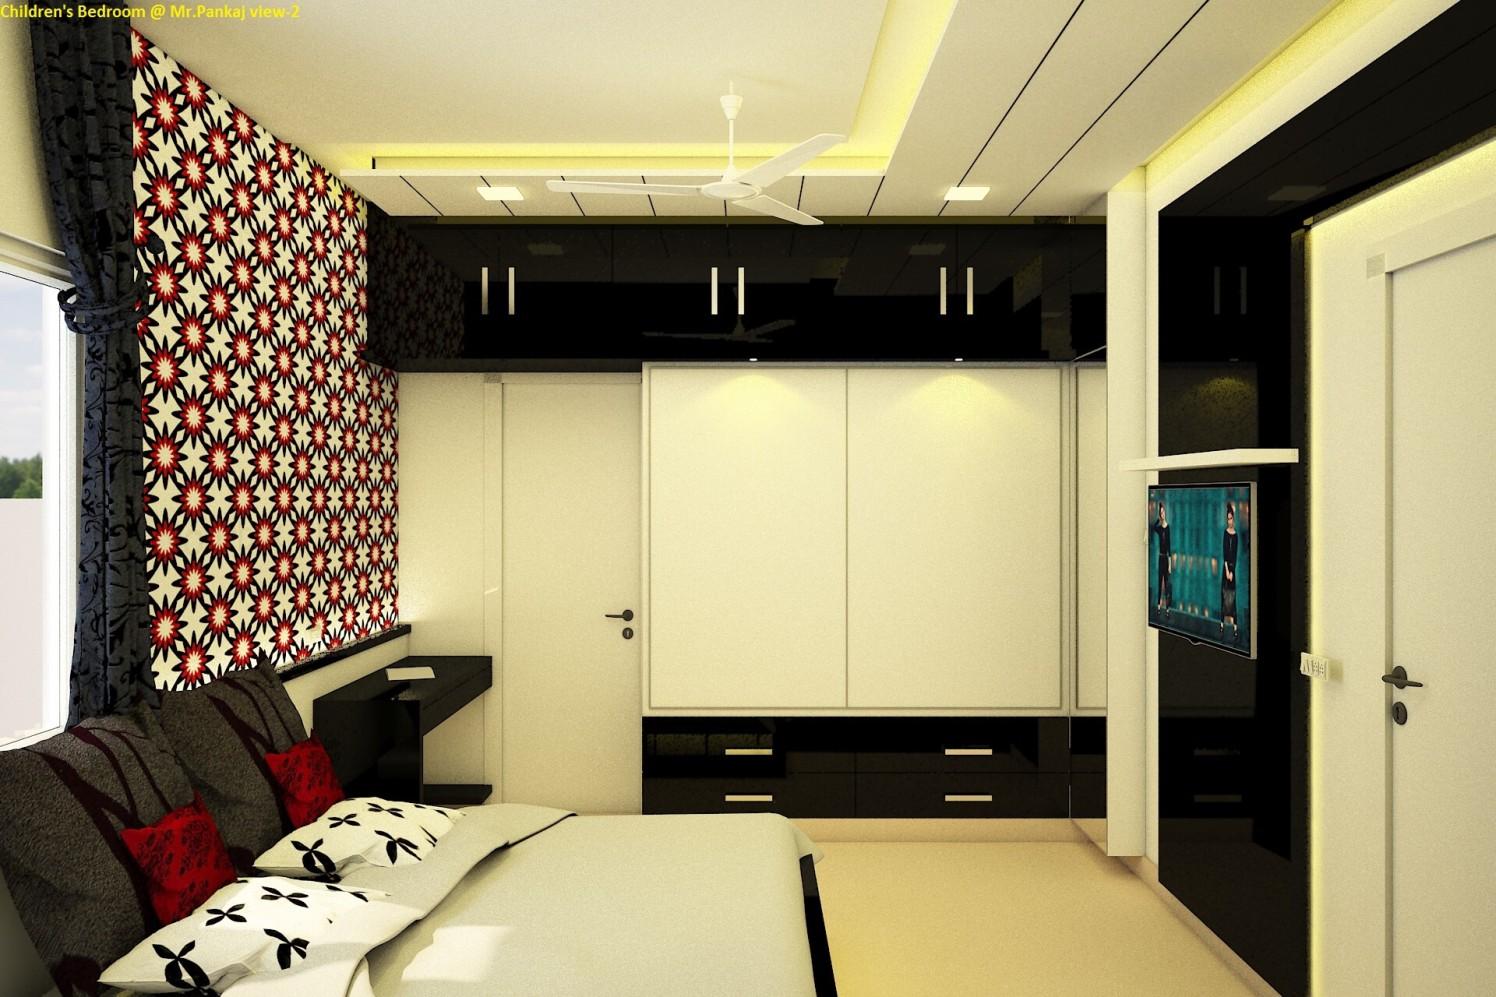 Coffee & cream by Pakshal Bafna Modern | Interior Design Photos & Ideas